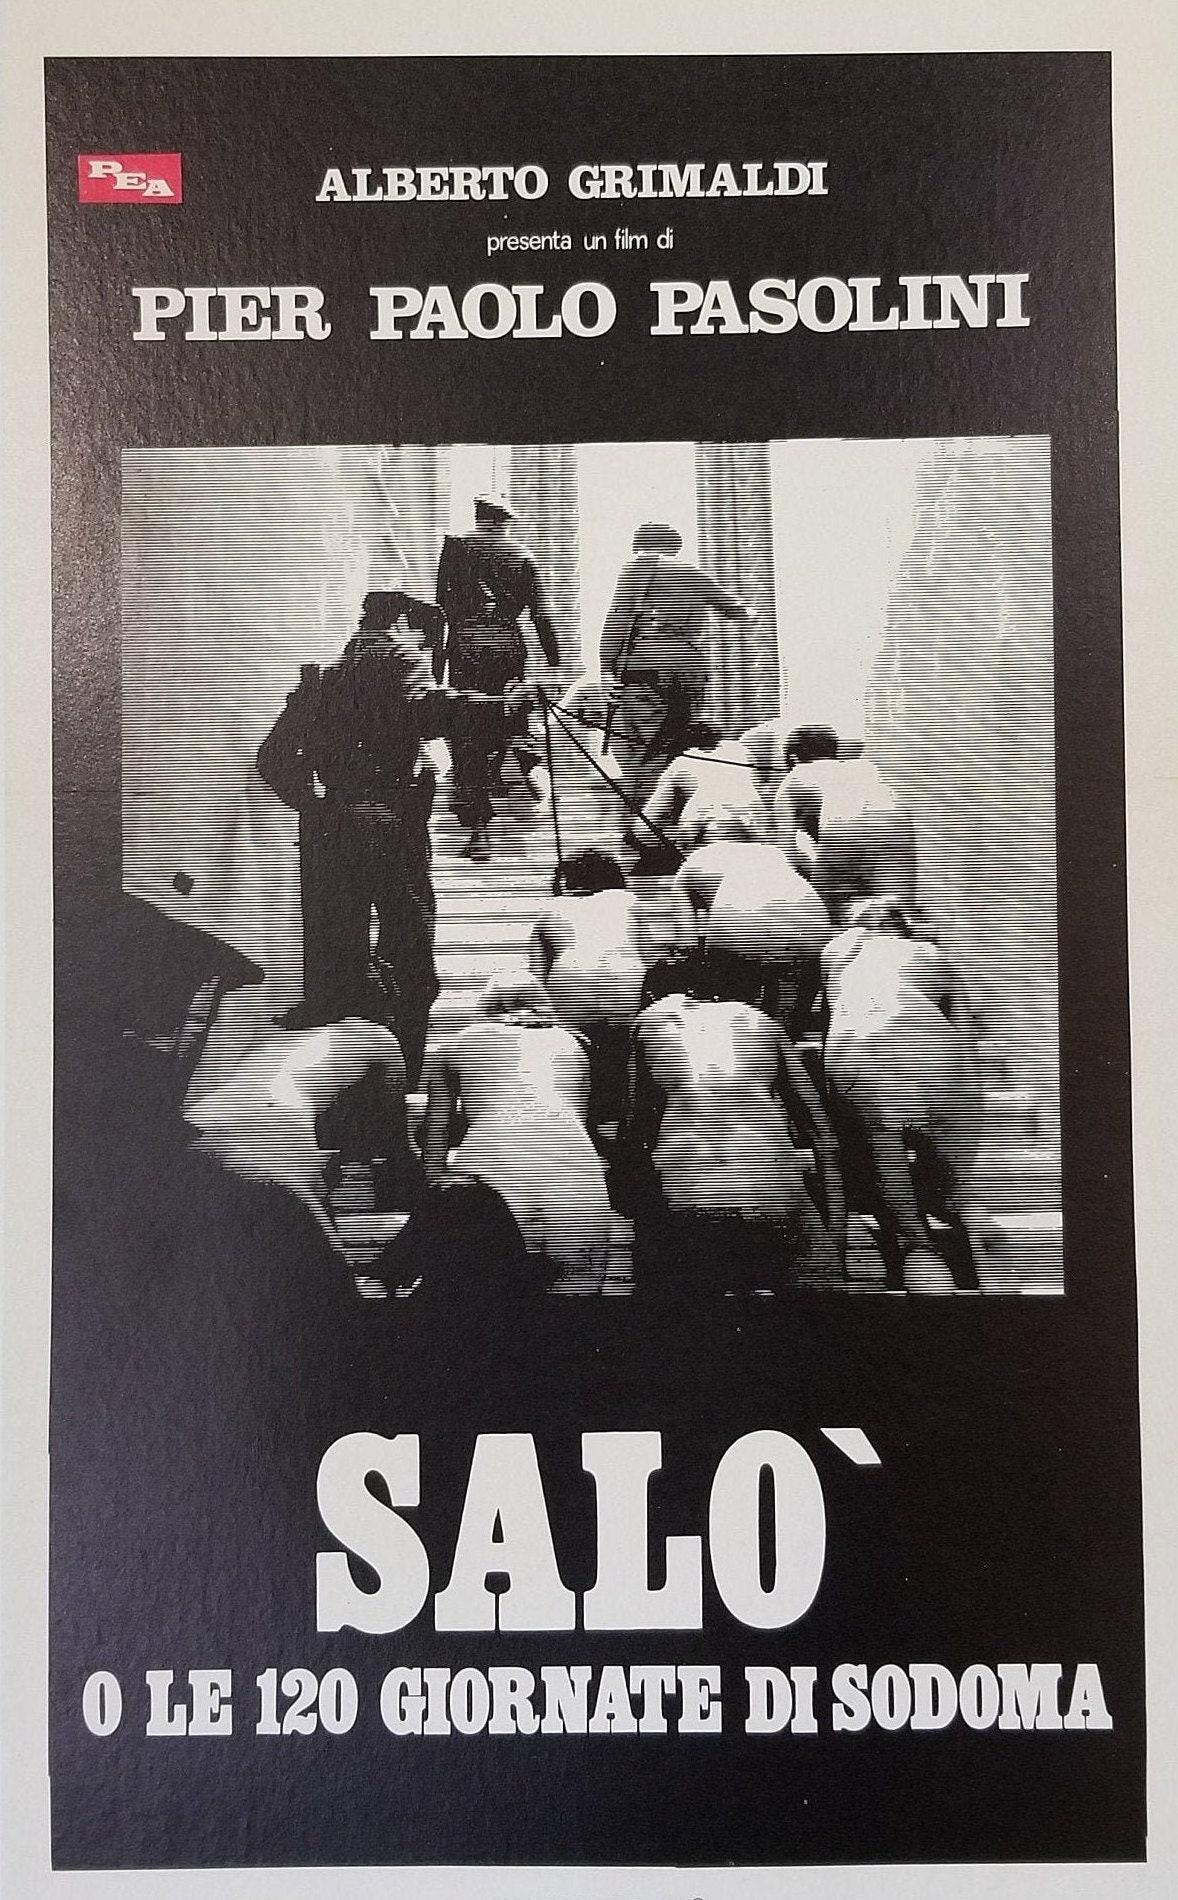 Salo 20 Days Of Sodom A Rare Original Vintage Italian Movie Poster of  the Dark Erotic Brutalist Drama by director Pier Paolo Pasolini